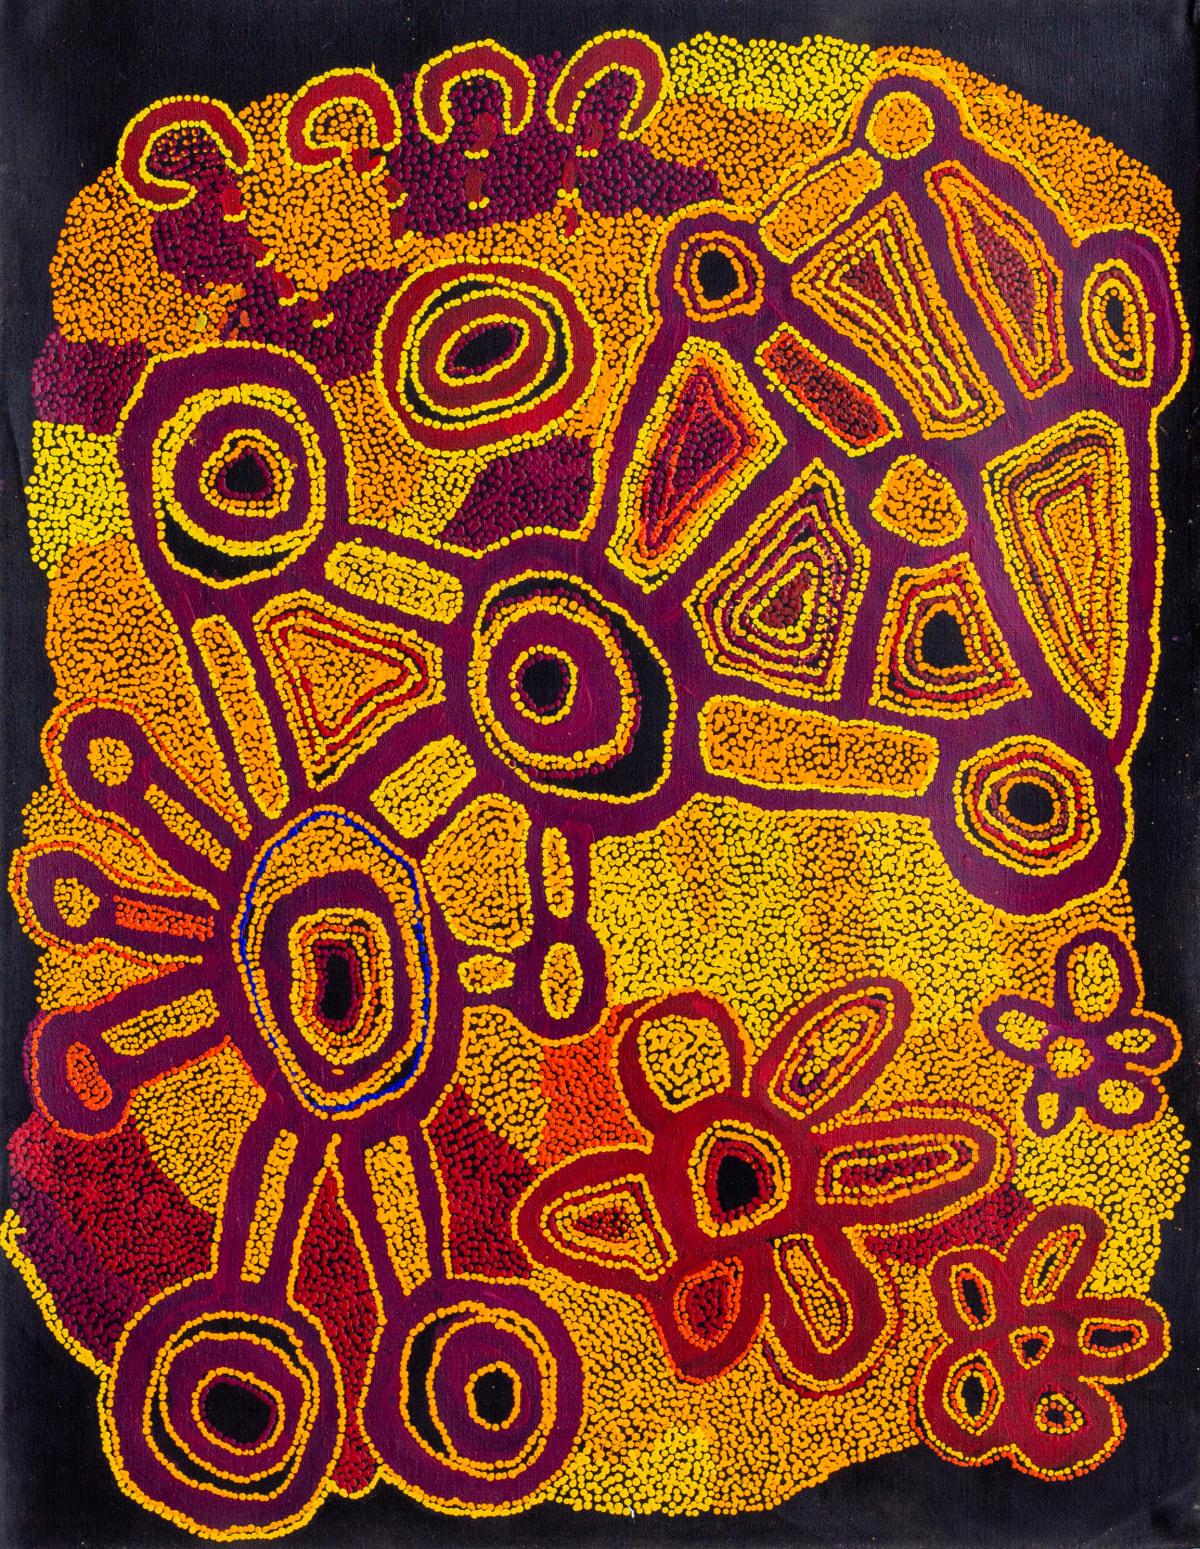 Ngalpingka Simms Wayiyul, 2019 Acrylic on linen 110 x 85 cm